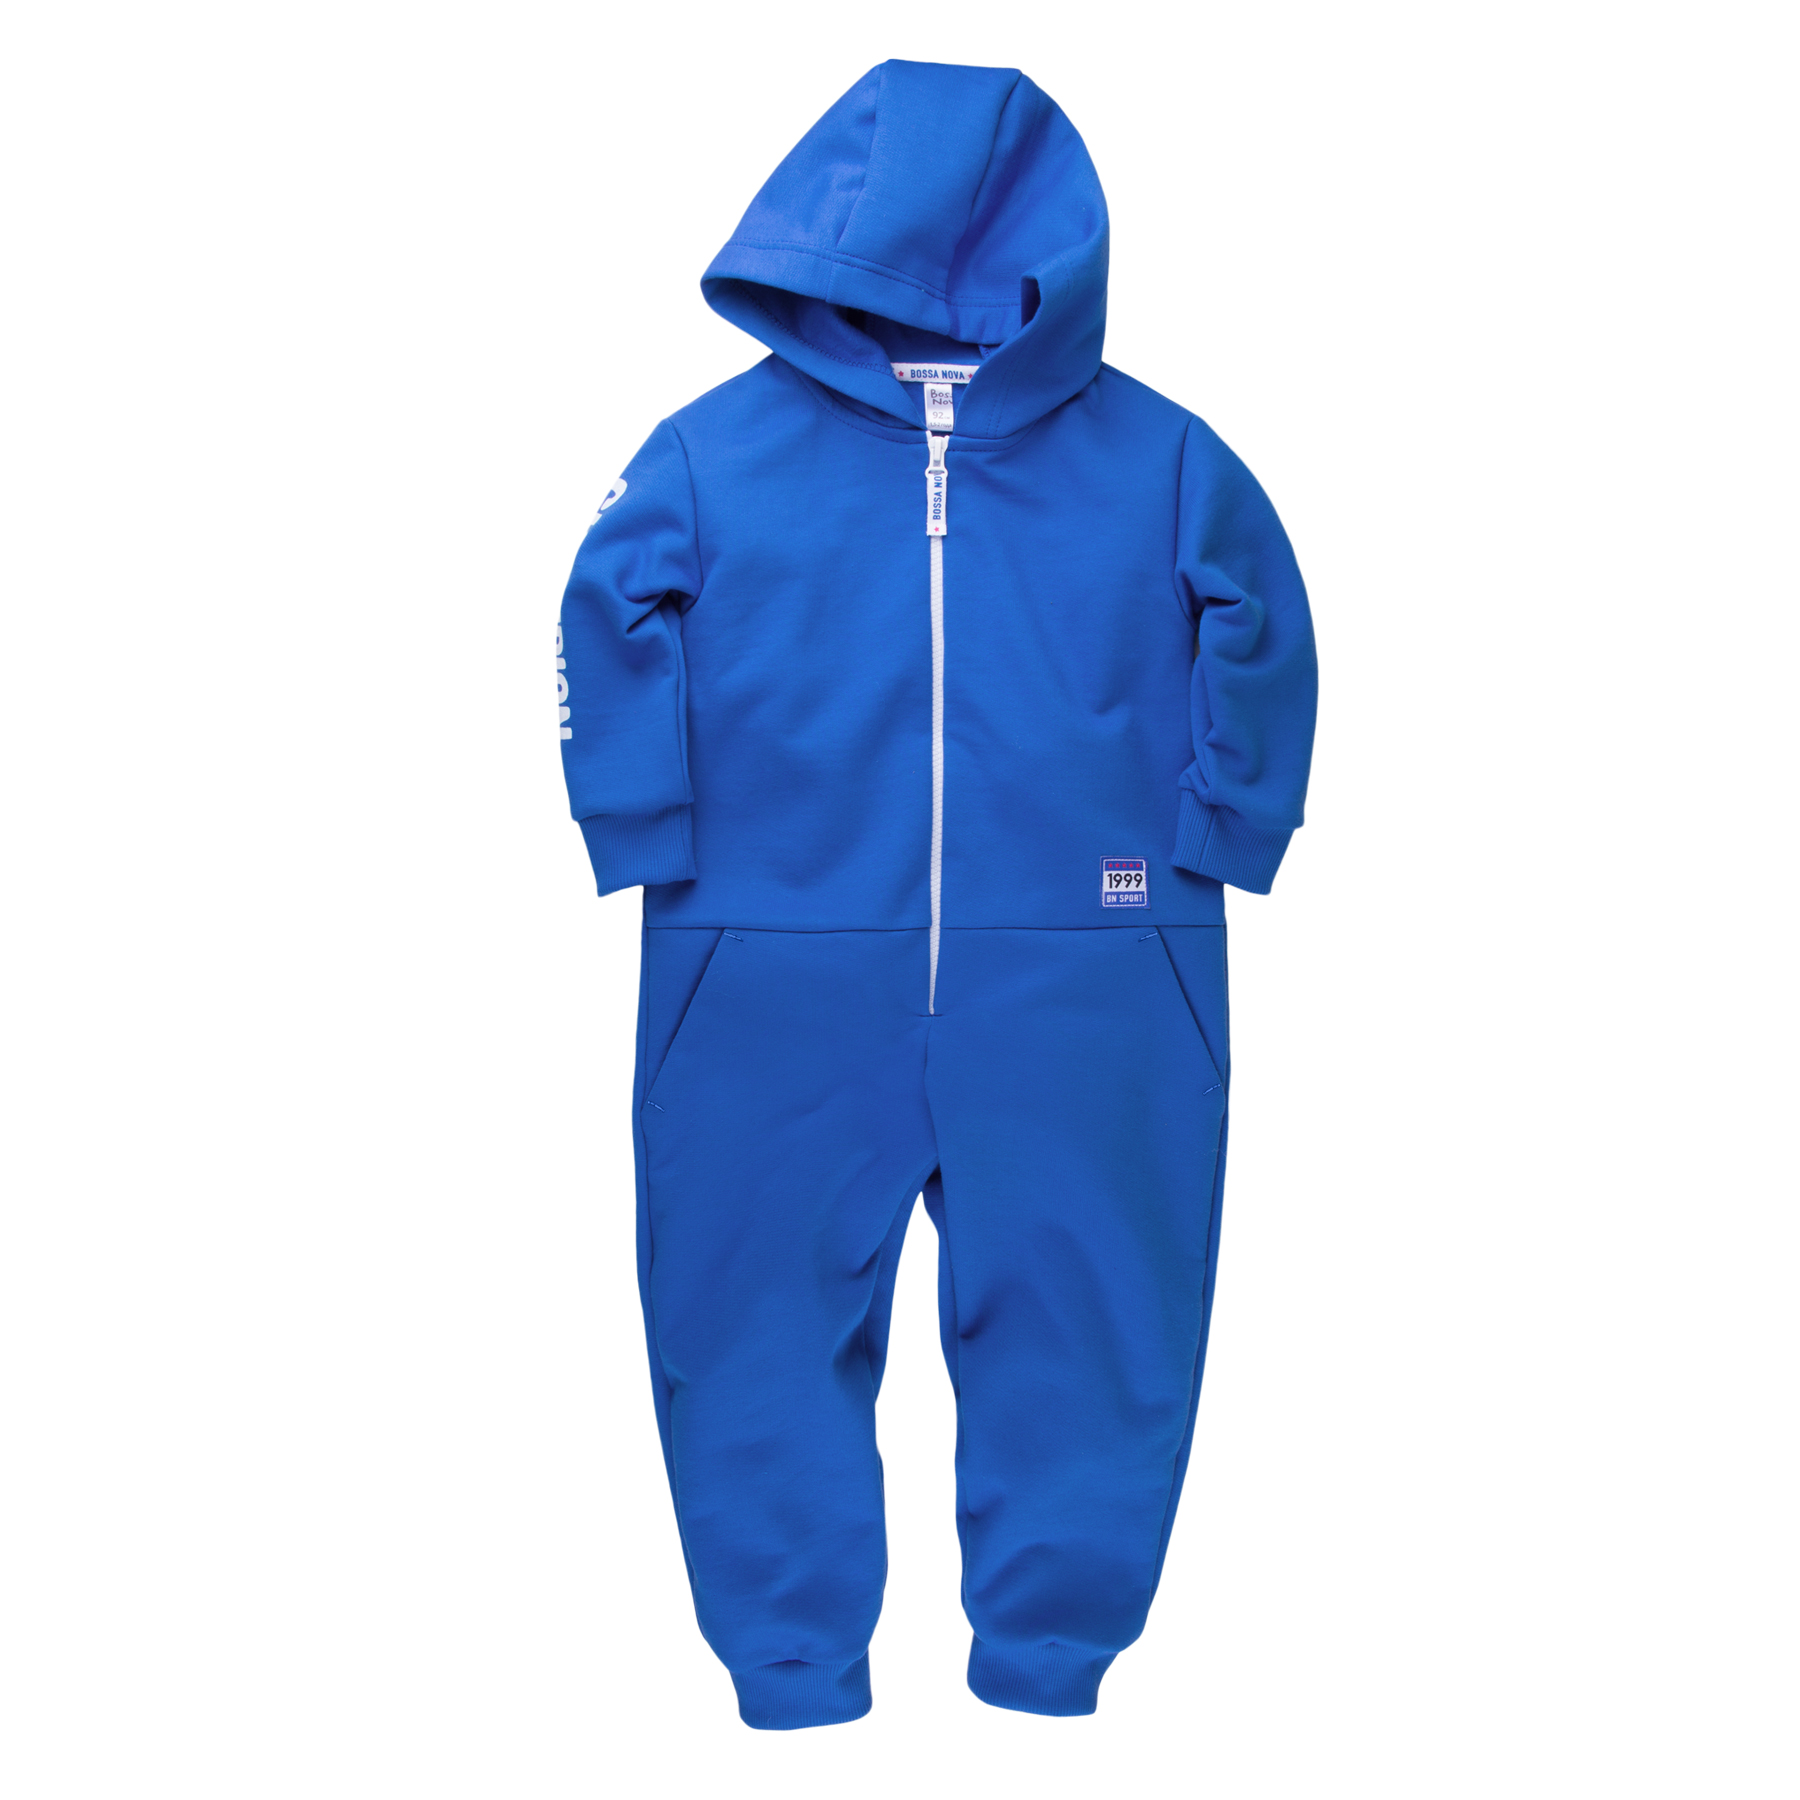 Jumpsuit with hoodie for boy BOSSA NOVA 510b-462e velvet drop shoulder hoodie with pocket